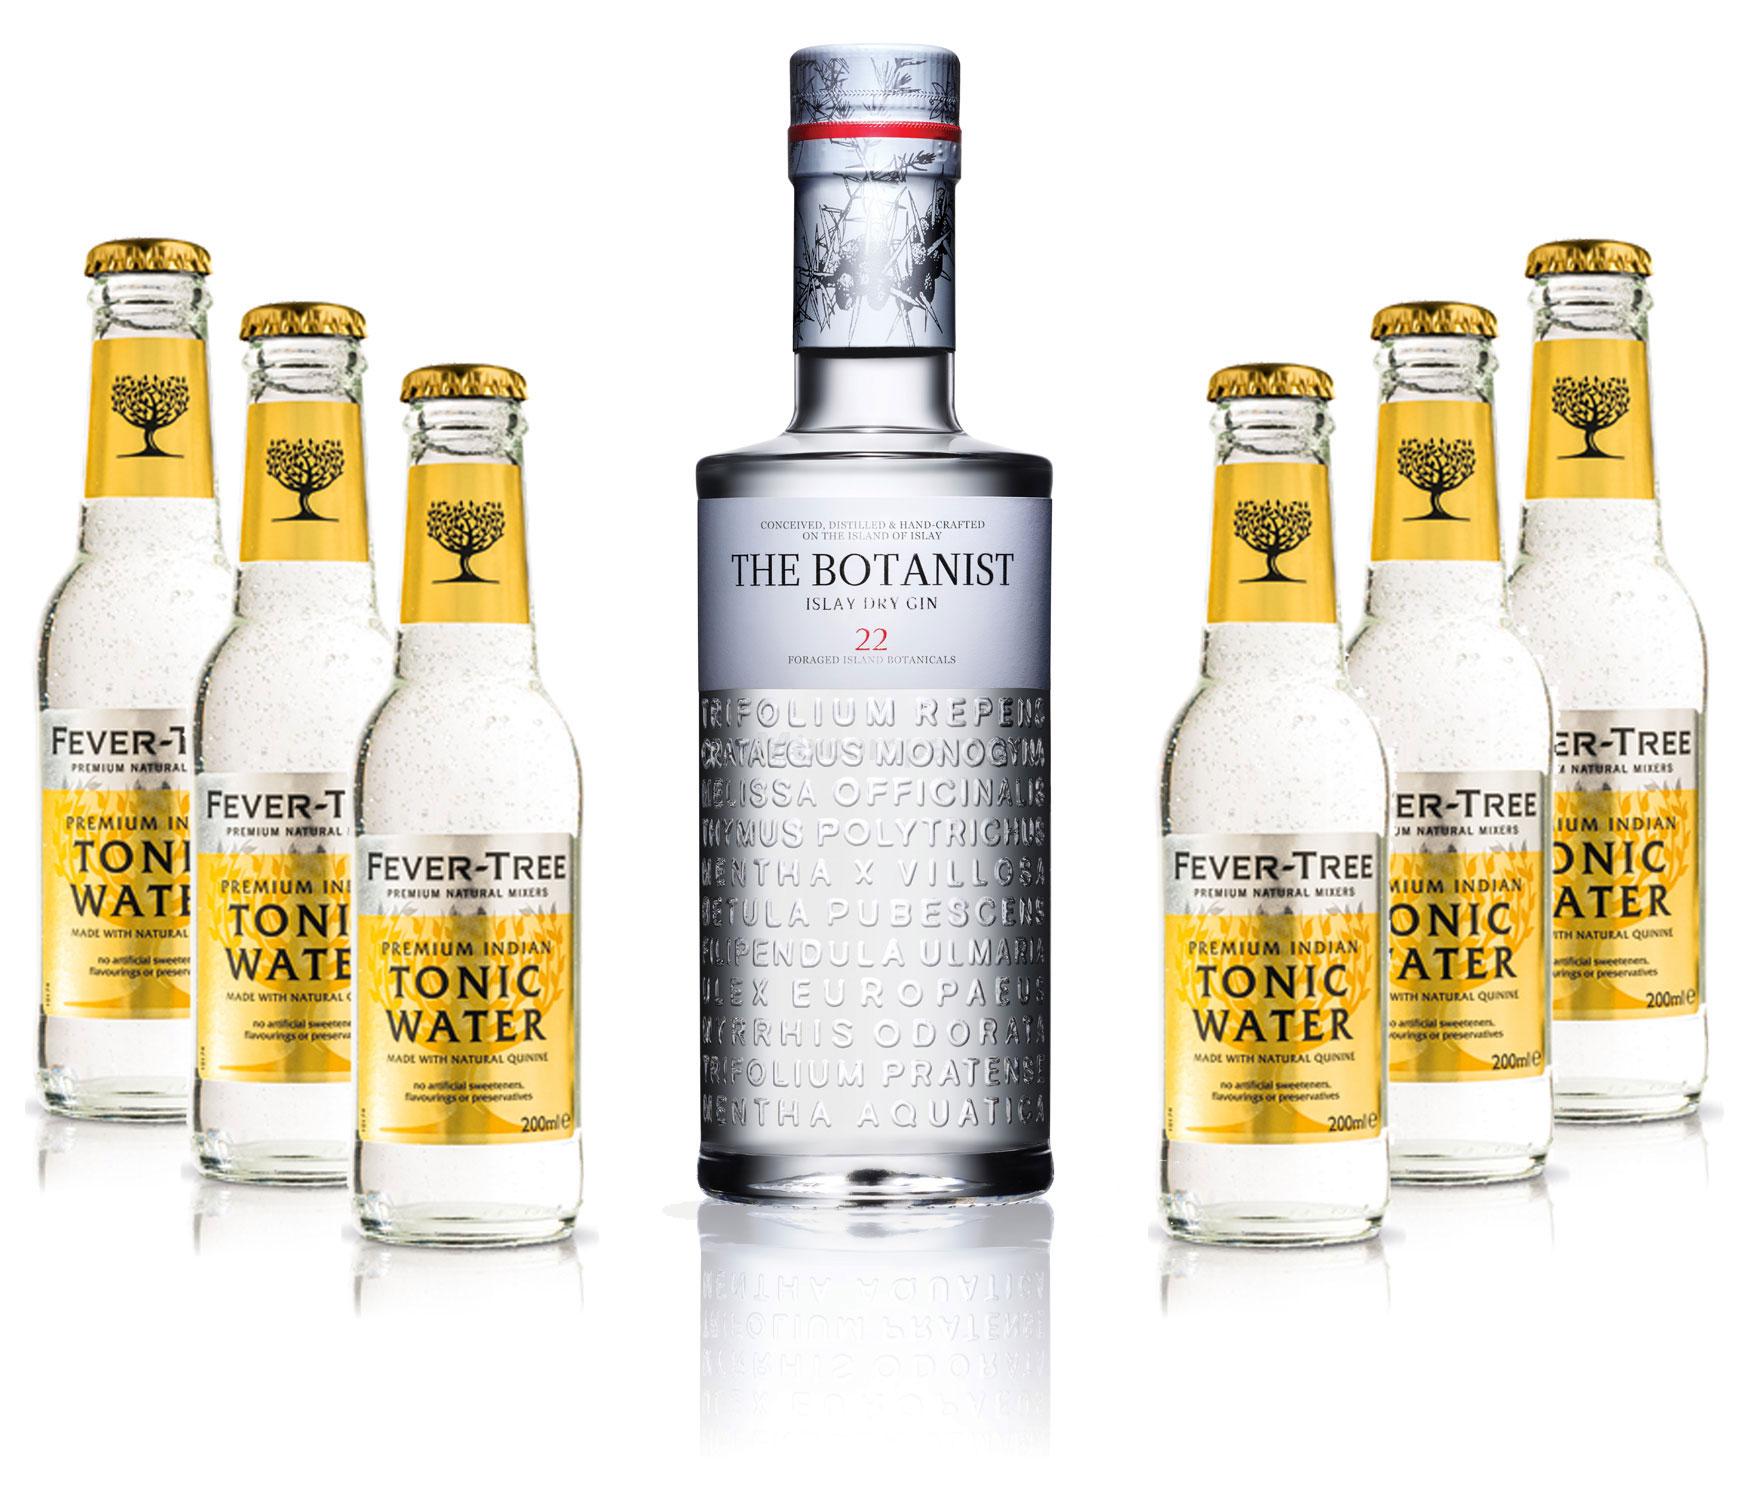 Gin Tonic Set - The Botanist Islay Dry Gin 0,7l 700ml (46% Vol) + 6x Fever Tree Tonic Water 200ml inkl. Pfand MEHRWEG